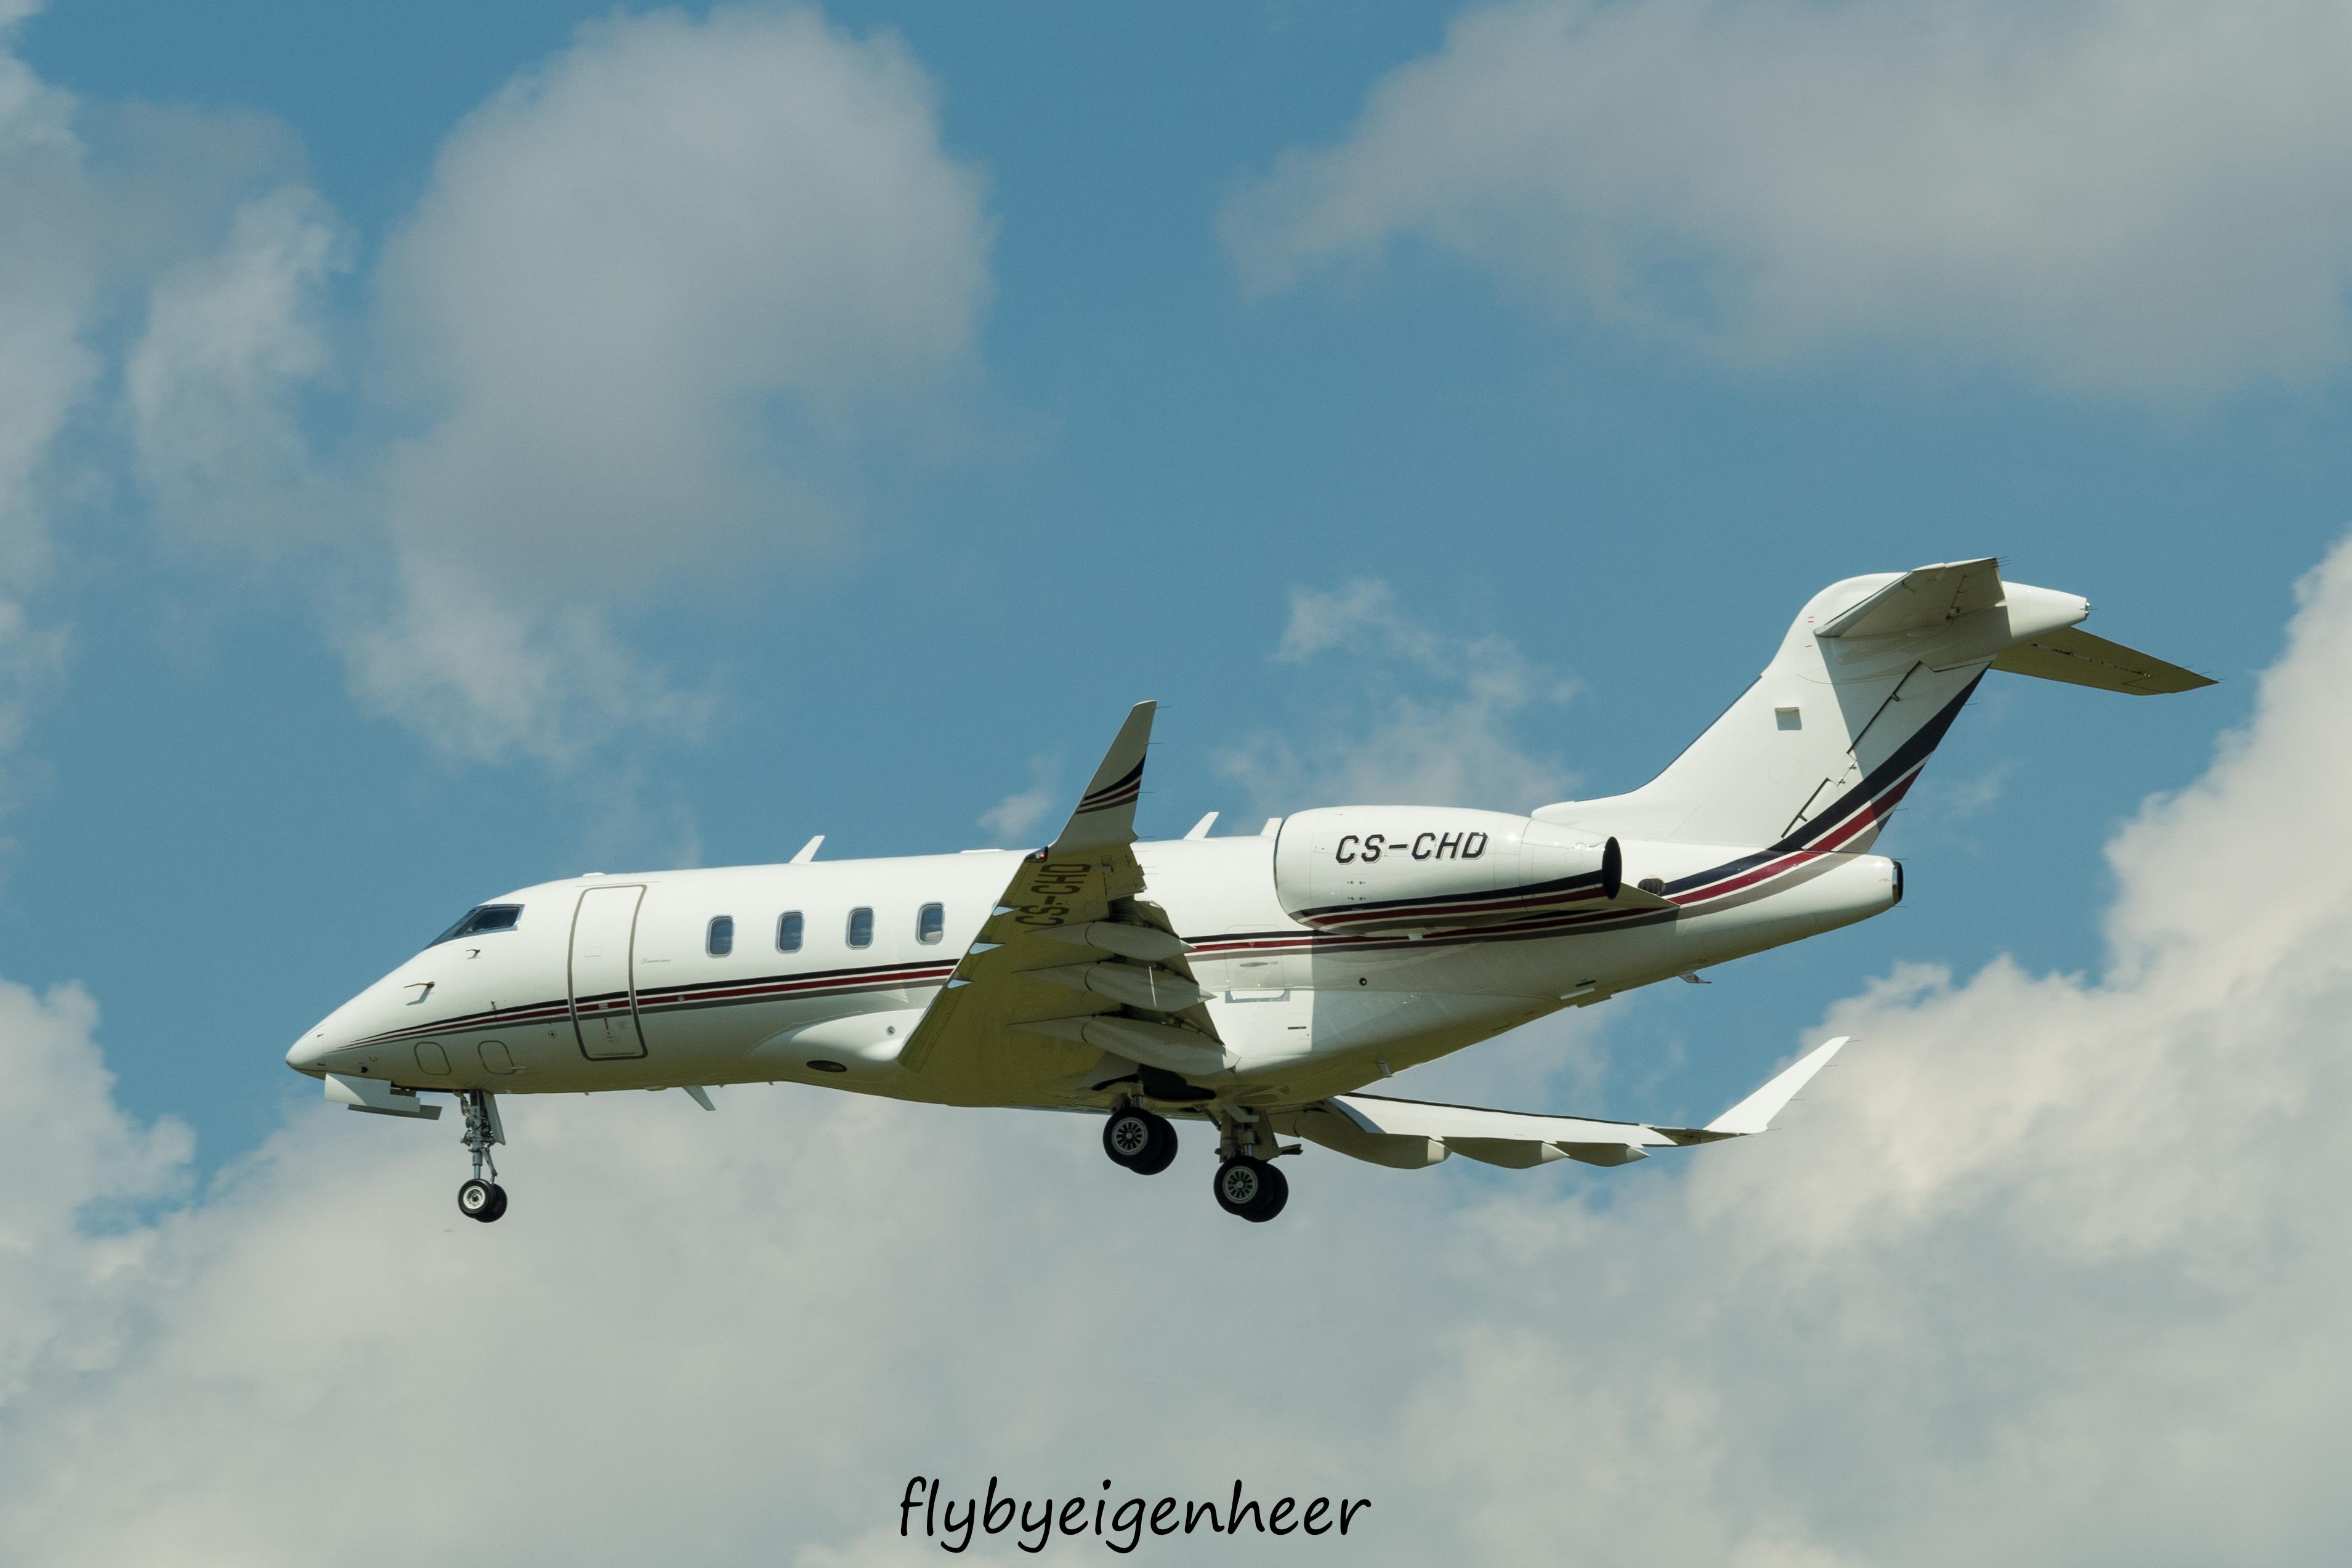 file cs chd bombardier bd 100 1a10 challenger 350 cl35 nje rh commons wikimedia org Challenger Ultralight Aircraft Bombardier Challenger Aircraft